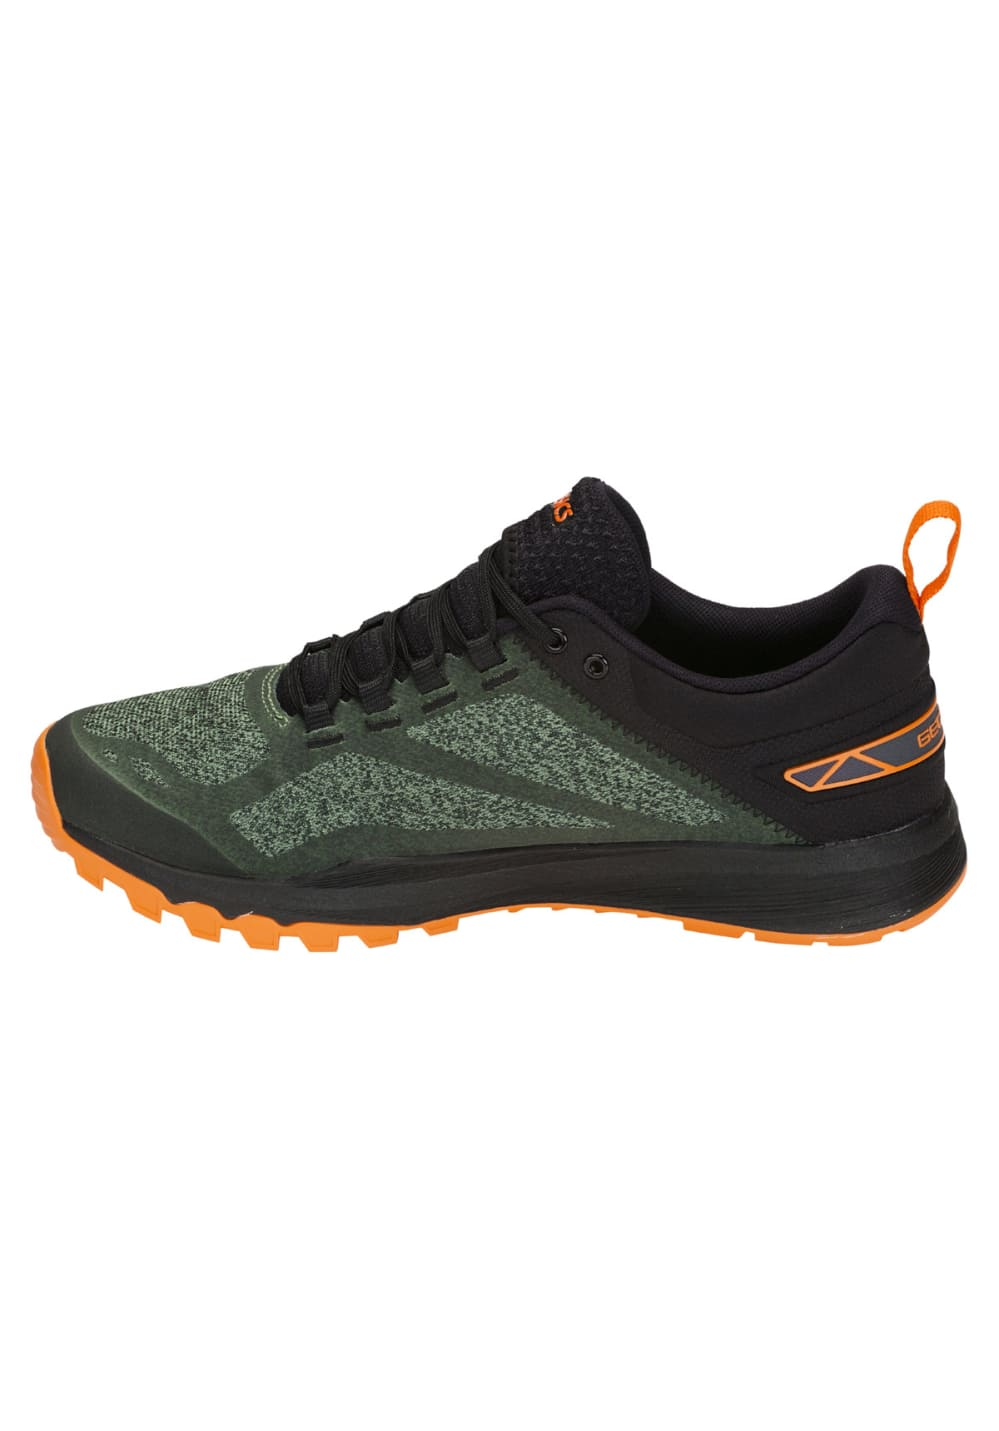 premium selection 8576d d5748 ASICS Gecko XT - Running shoes for Men - Black